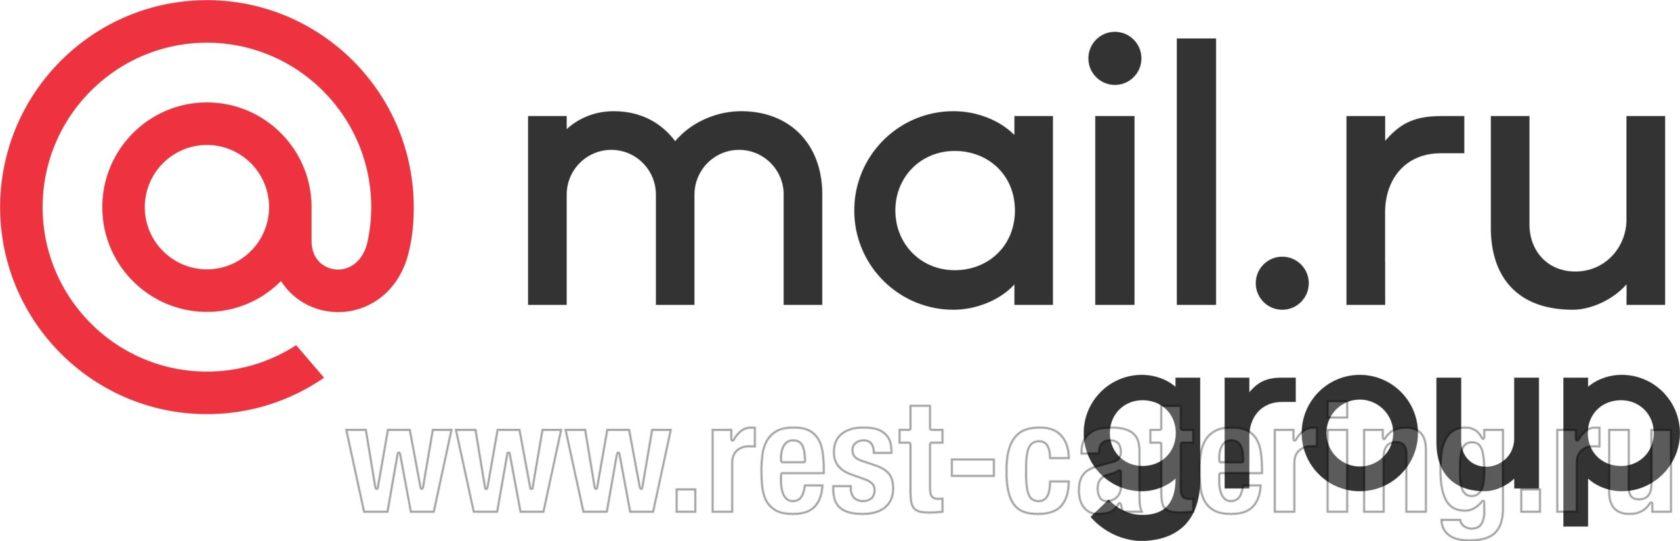 mail-logo-scaled.jpg